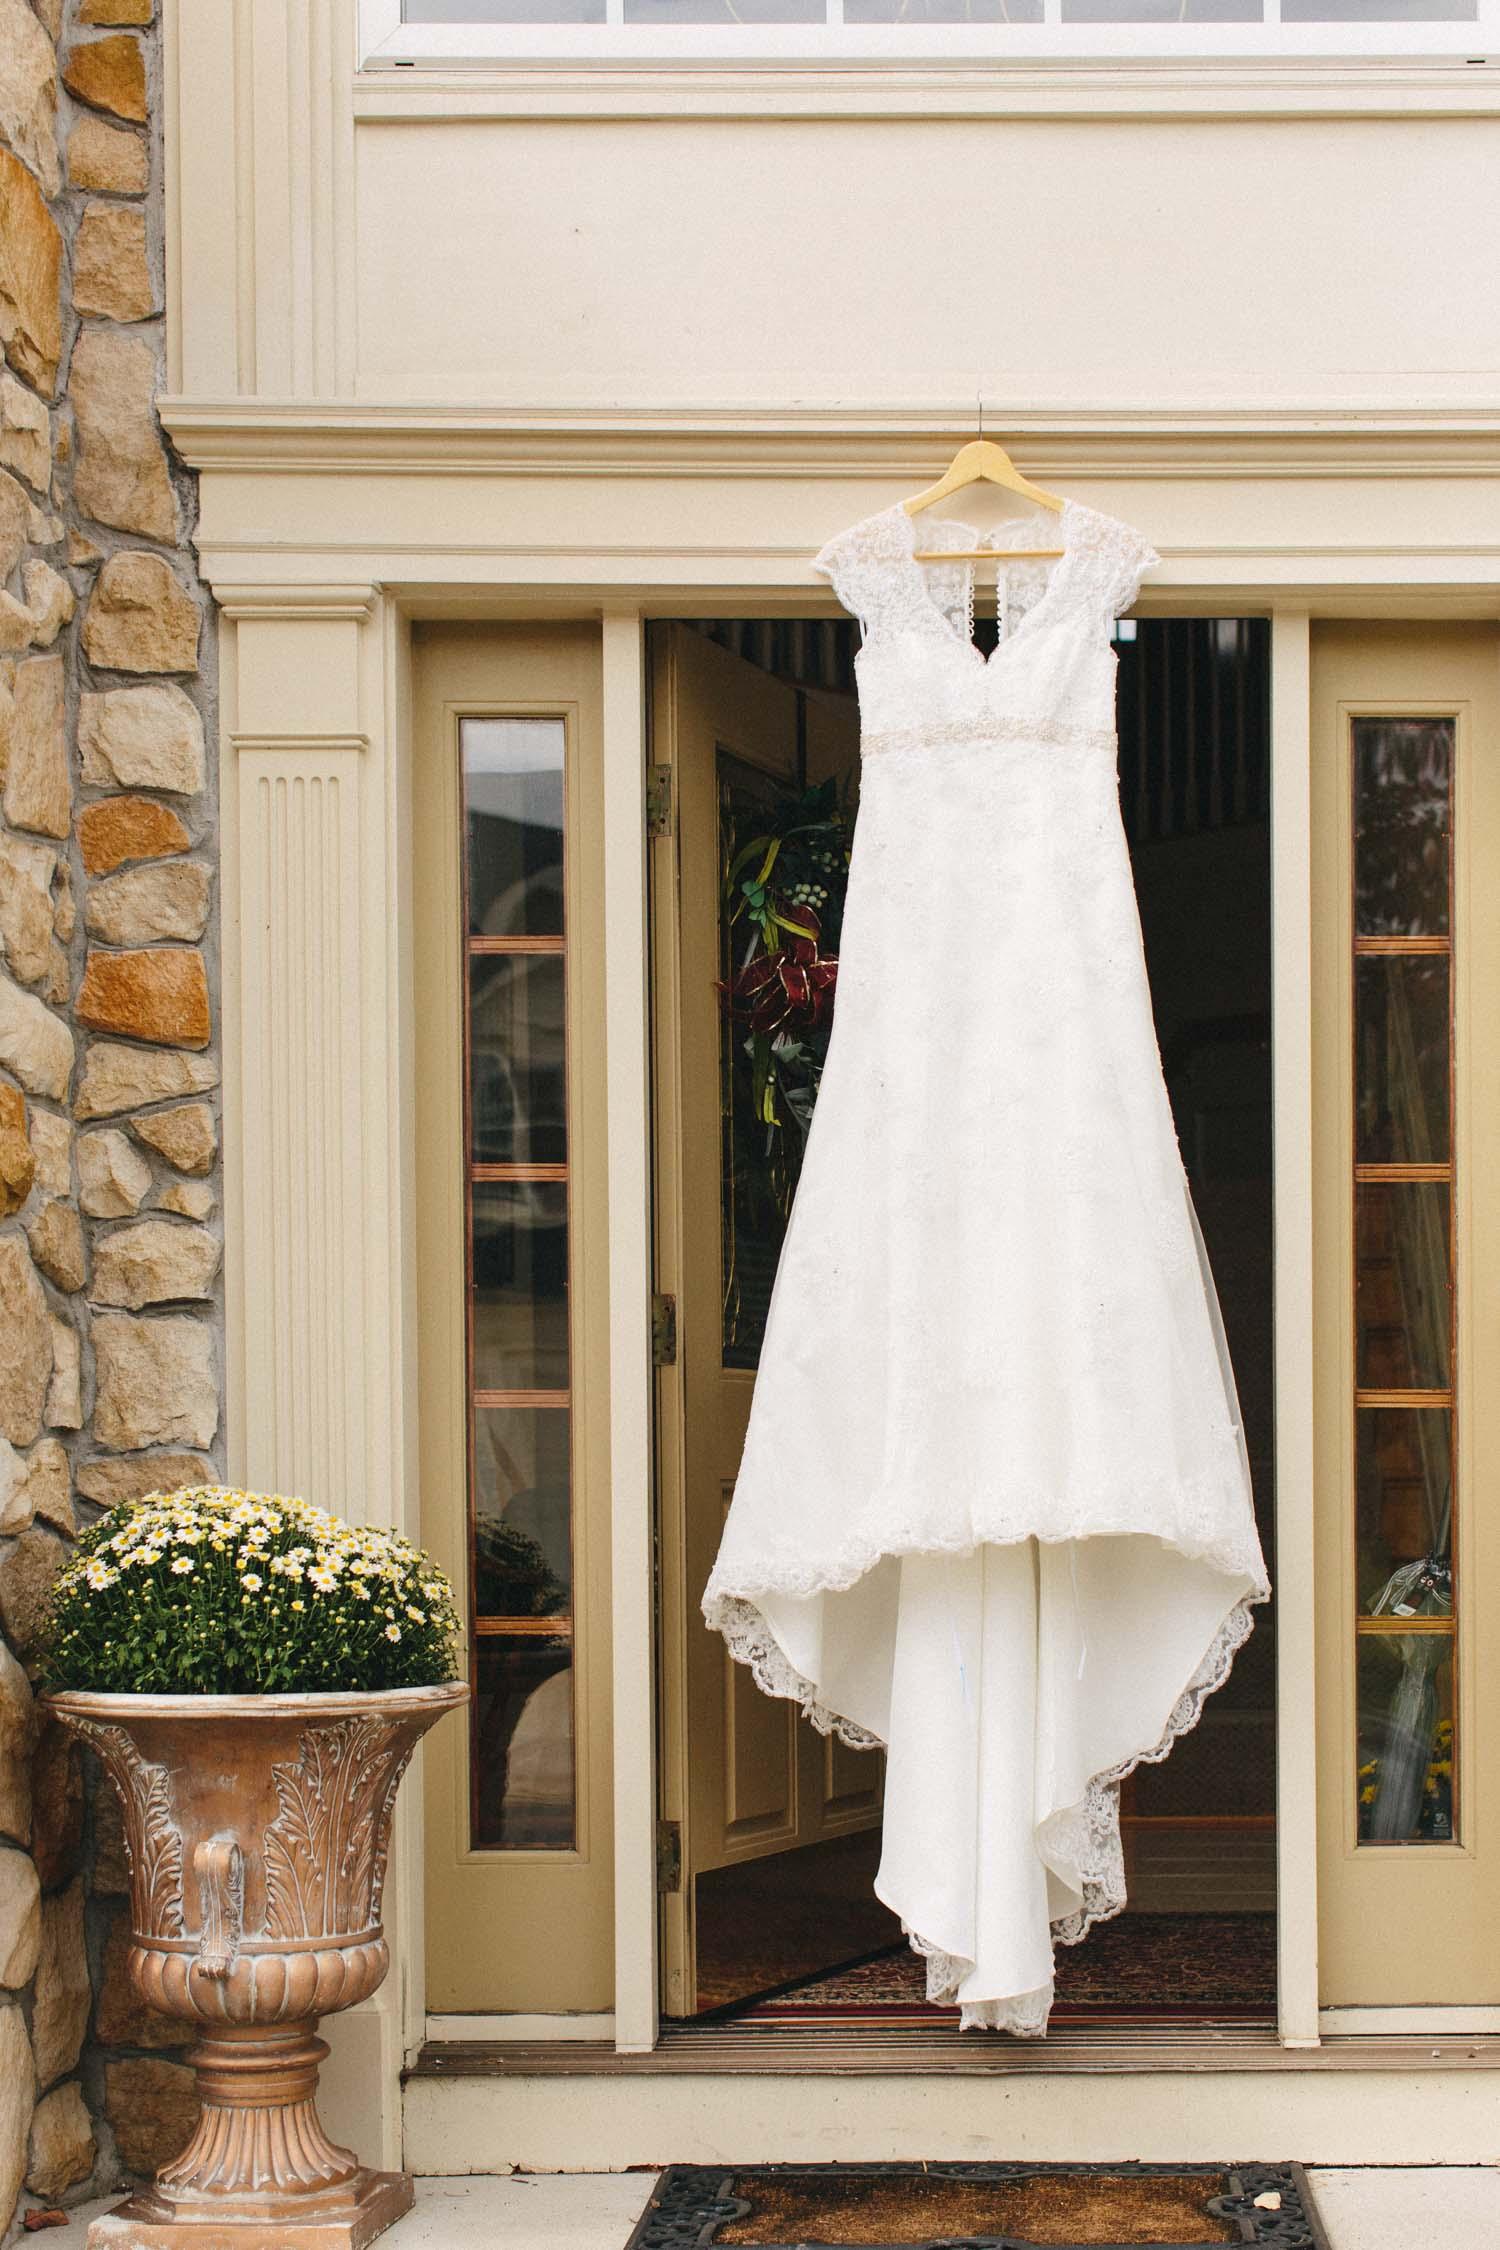 blp-lindsey-wedding-13.jpg